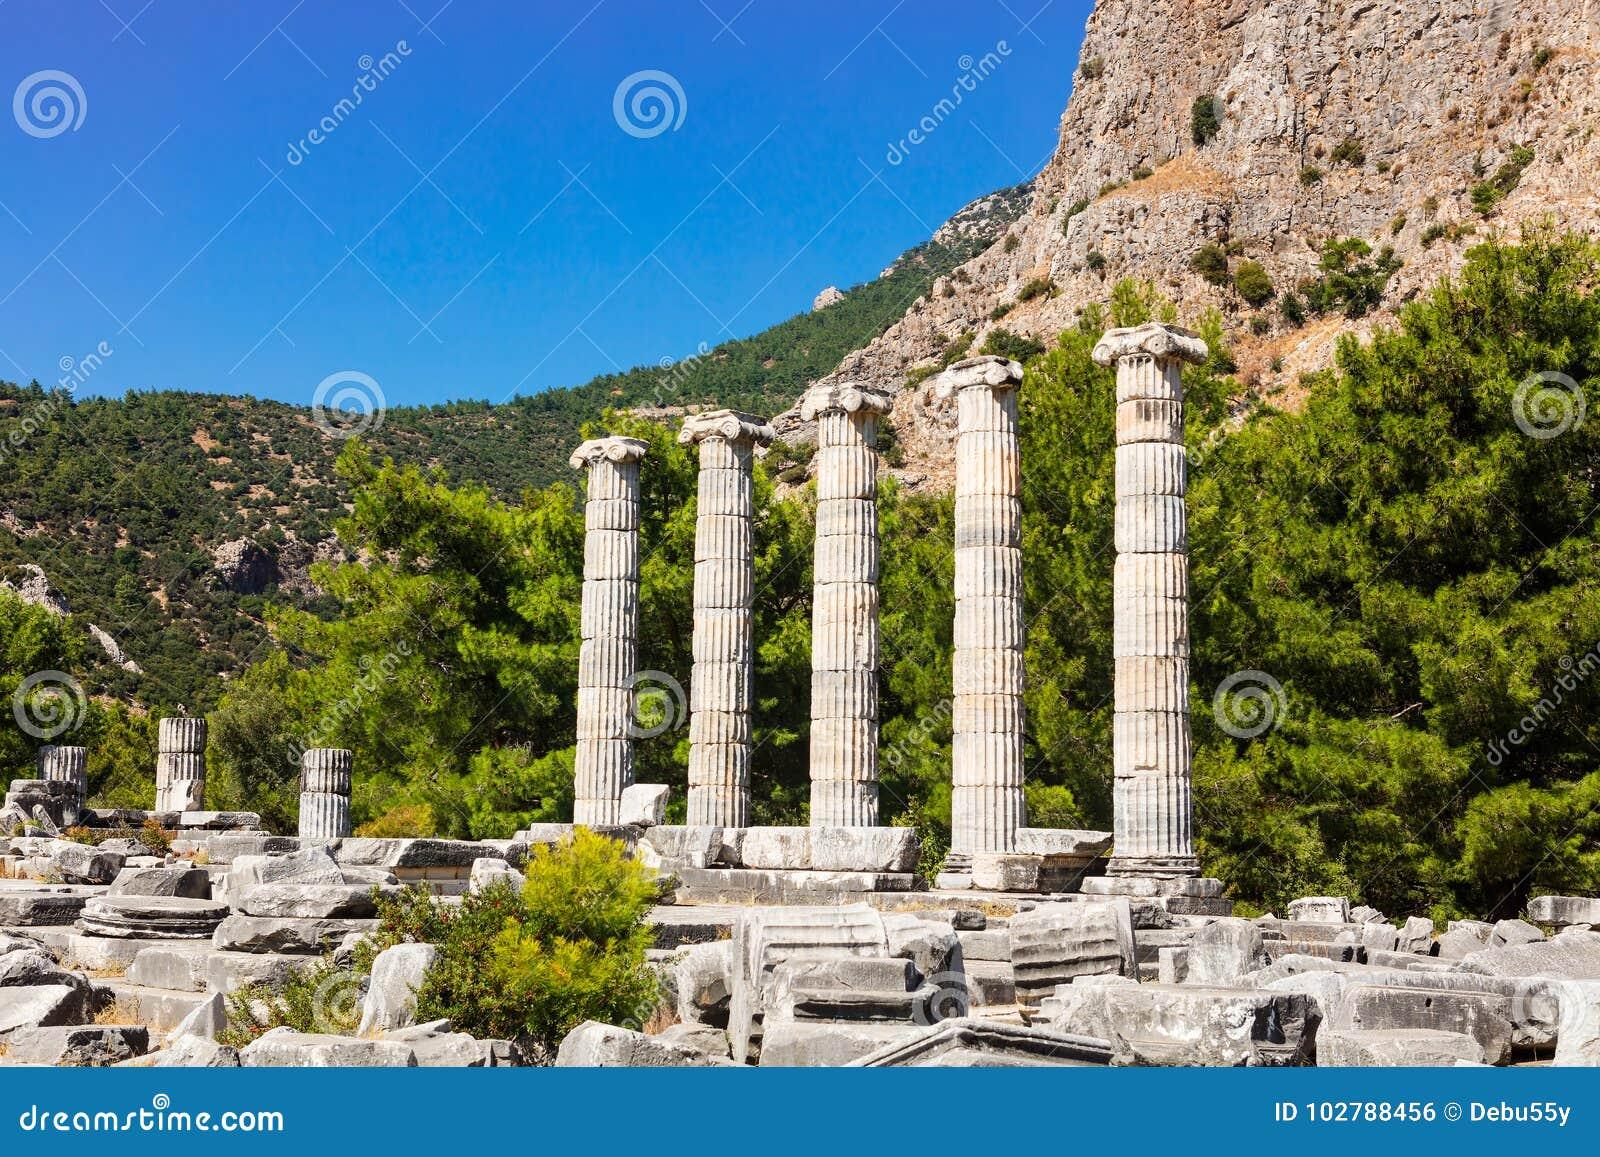 Athena Temple em Priene, Turquia